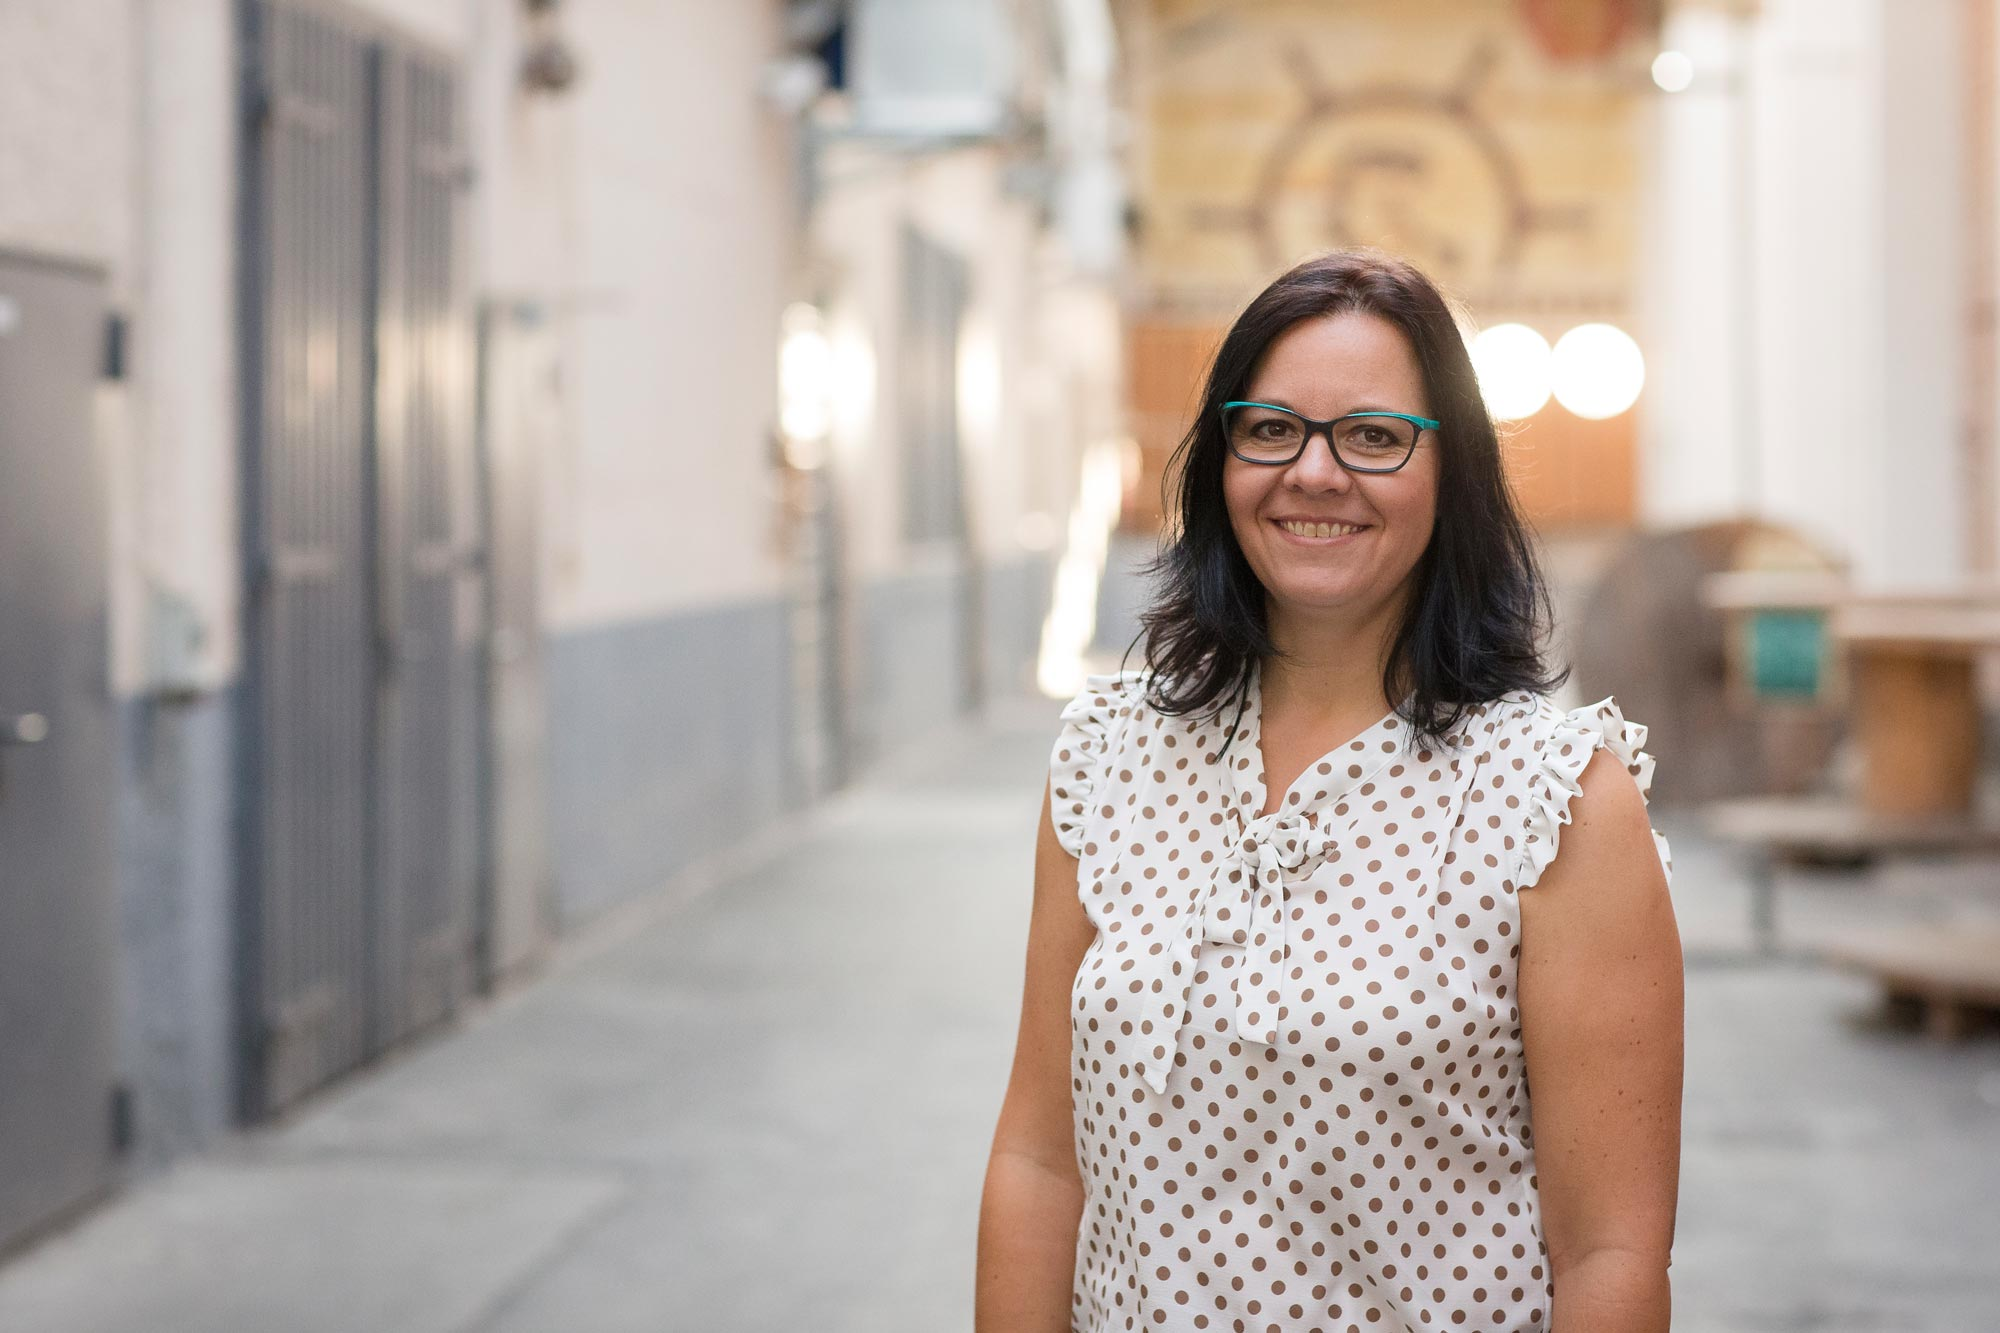 Katja Ellner ist Augenoptikermeisterin bei Optik Sagawe in Reutershagen